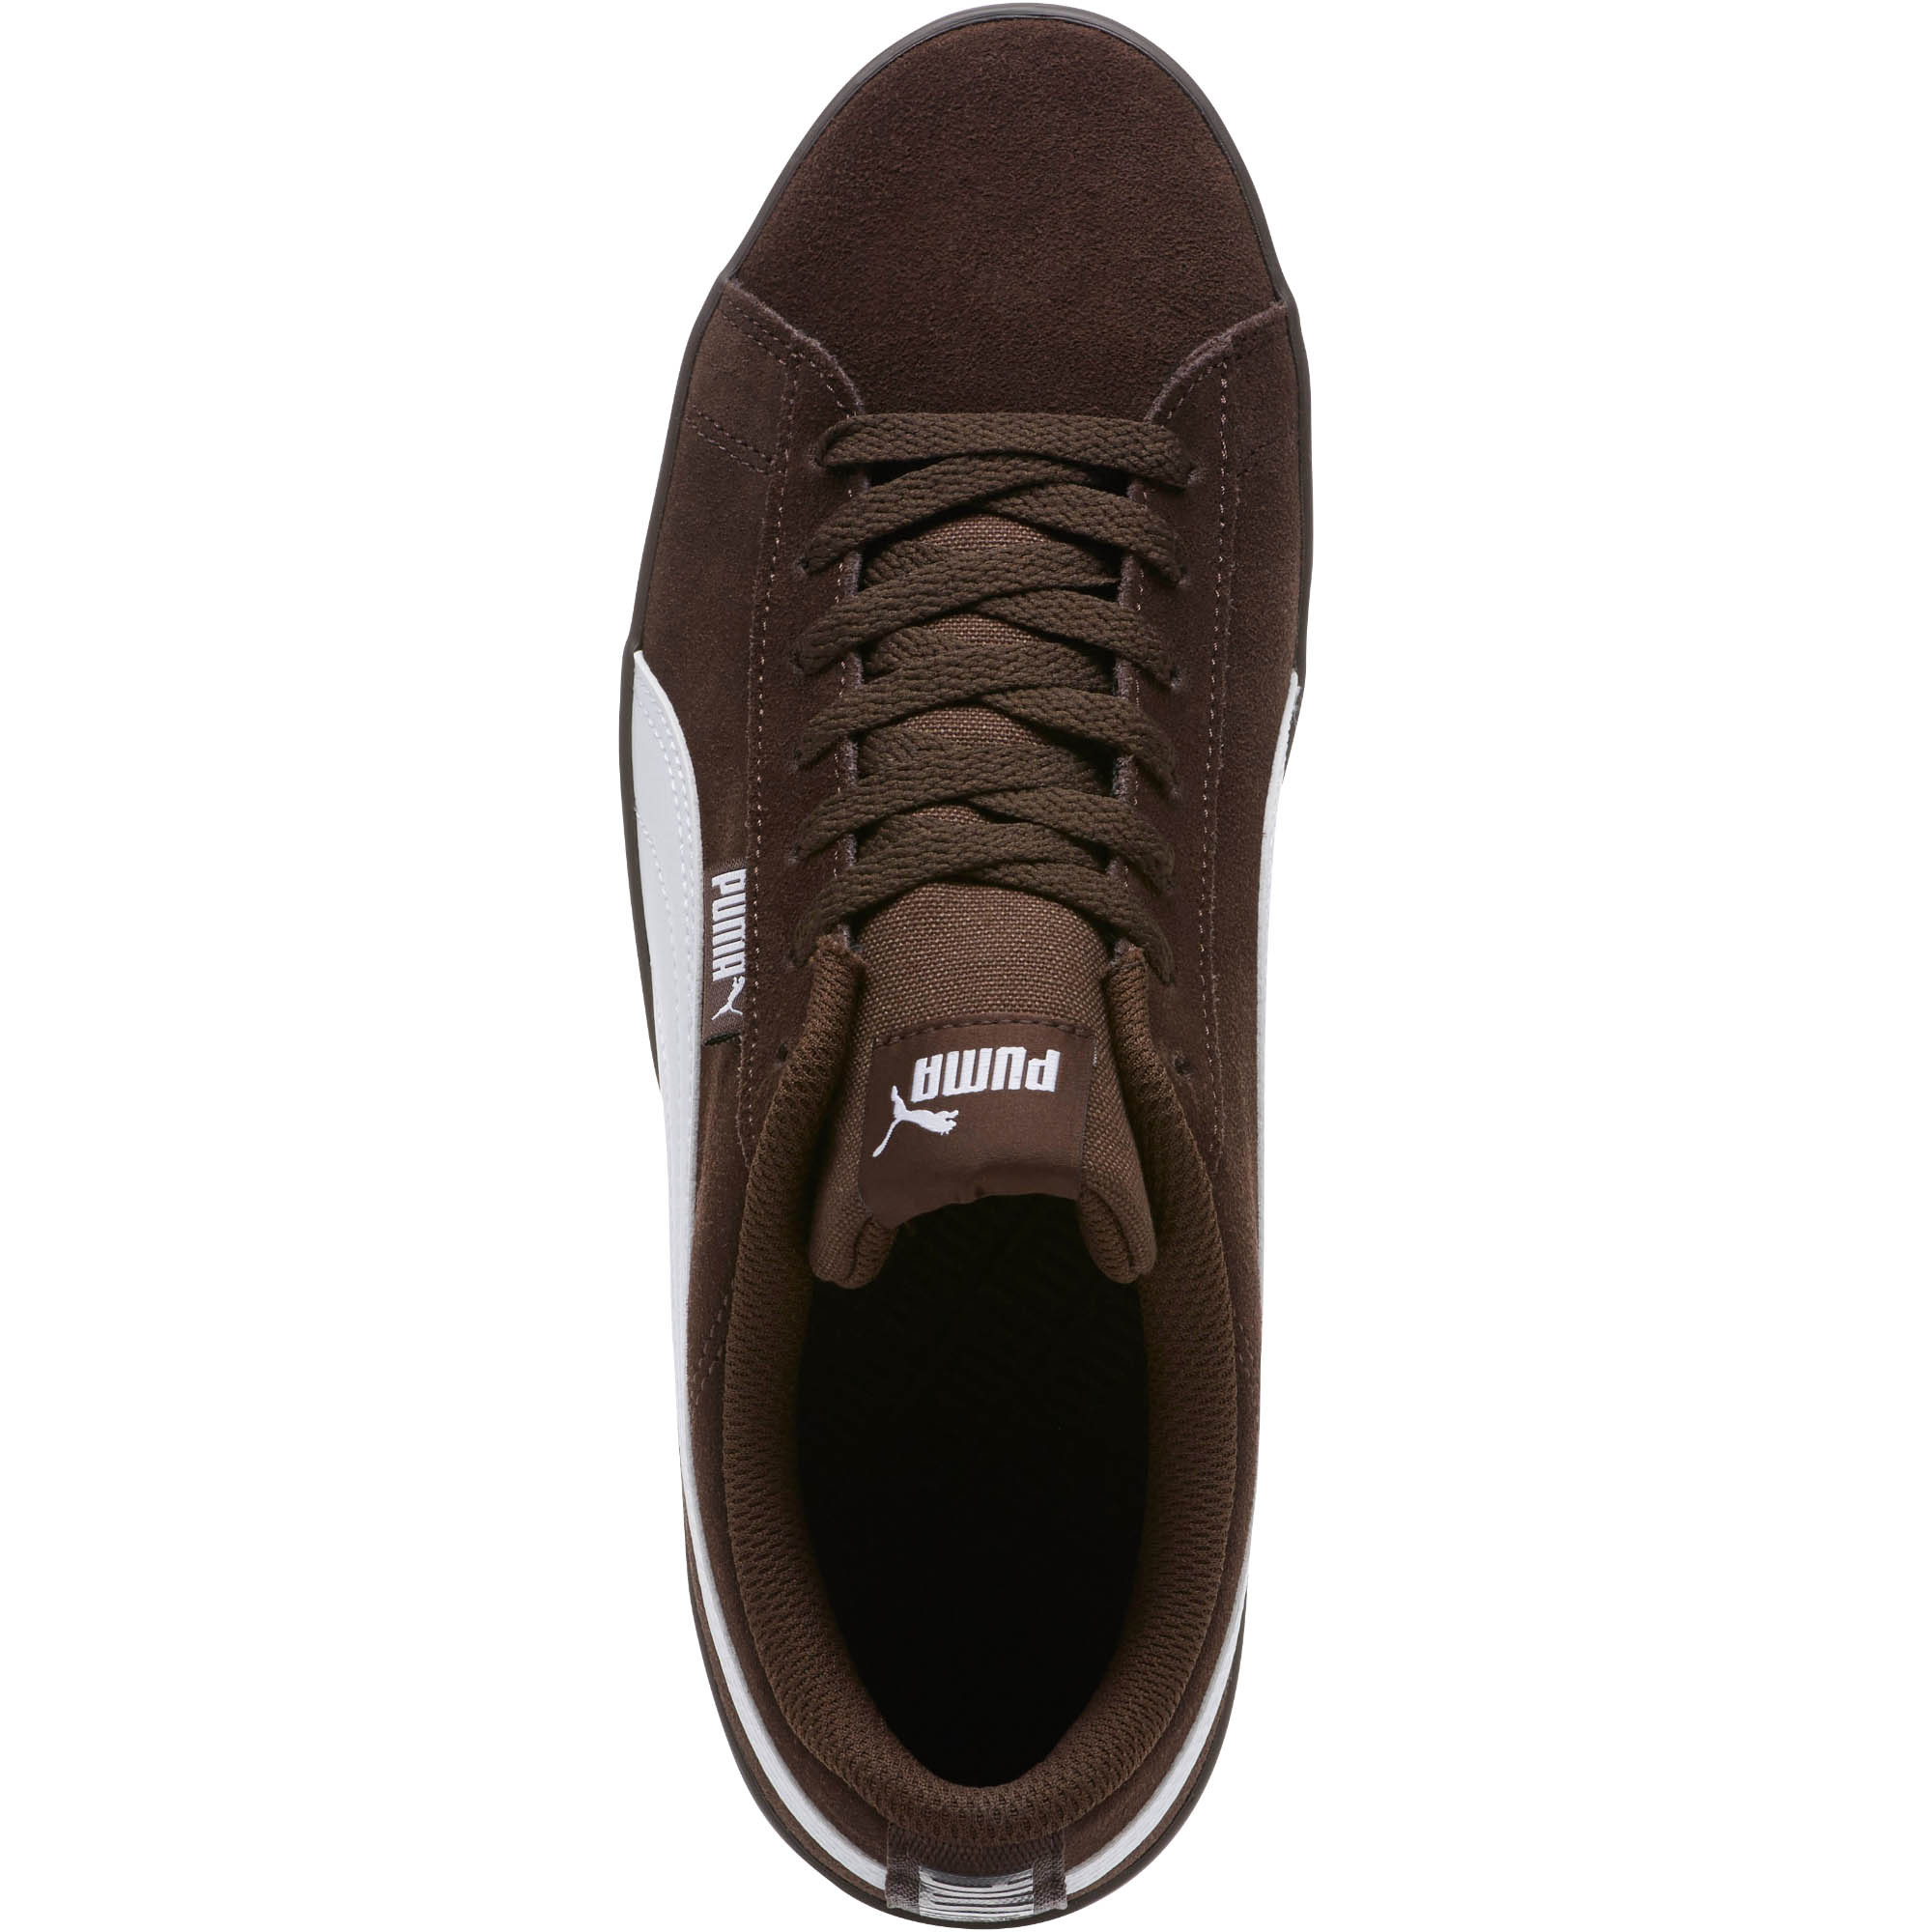 PUMA-Urban-Plus-Suede-Sneakers-Men-Shoe-Basics thumbnail 4